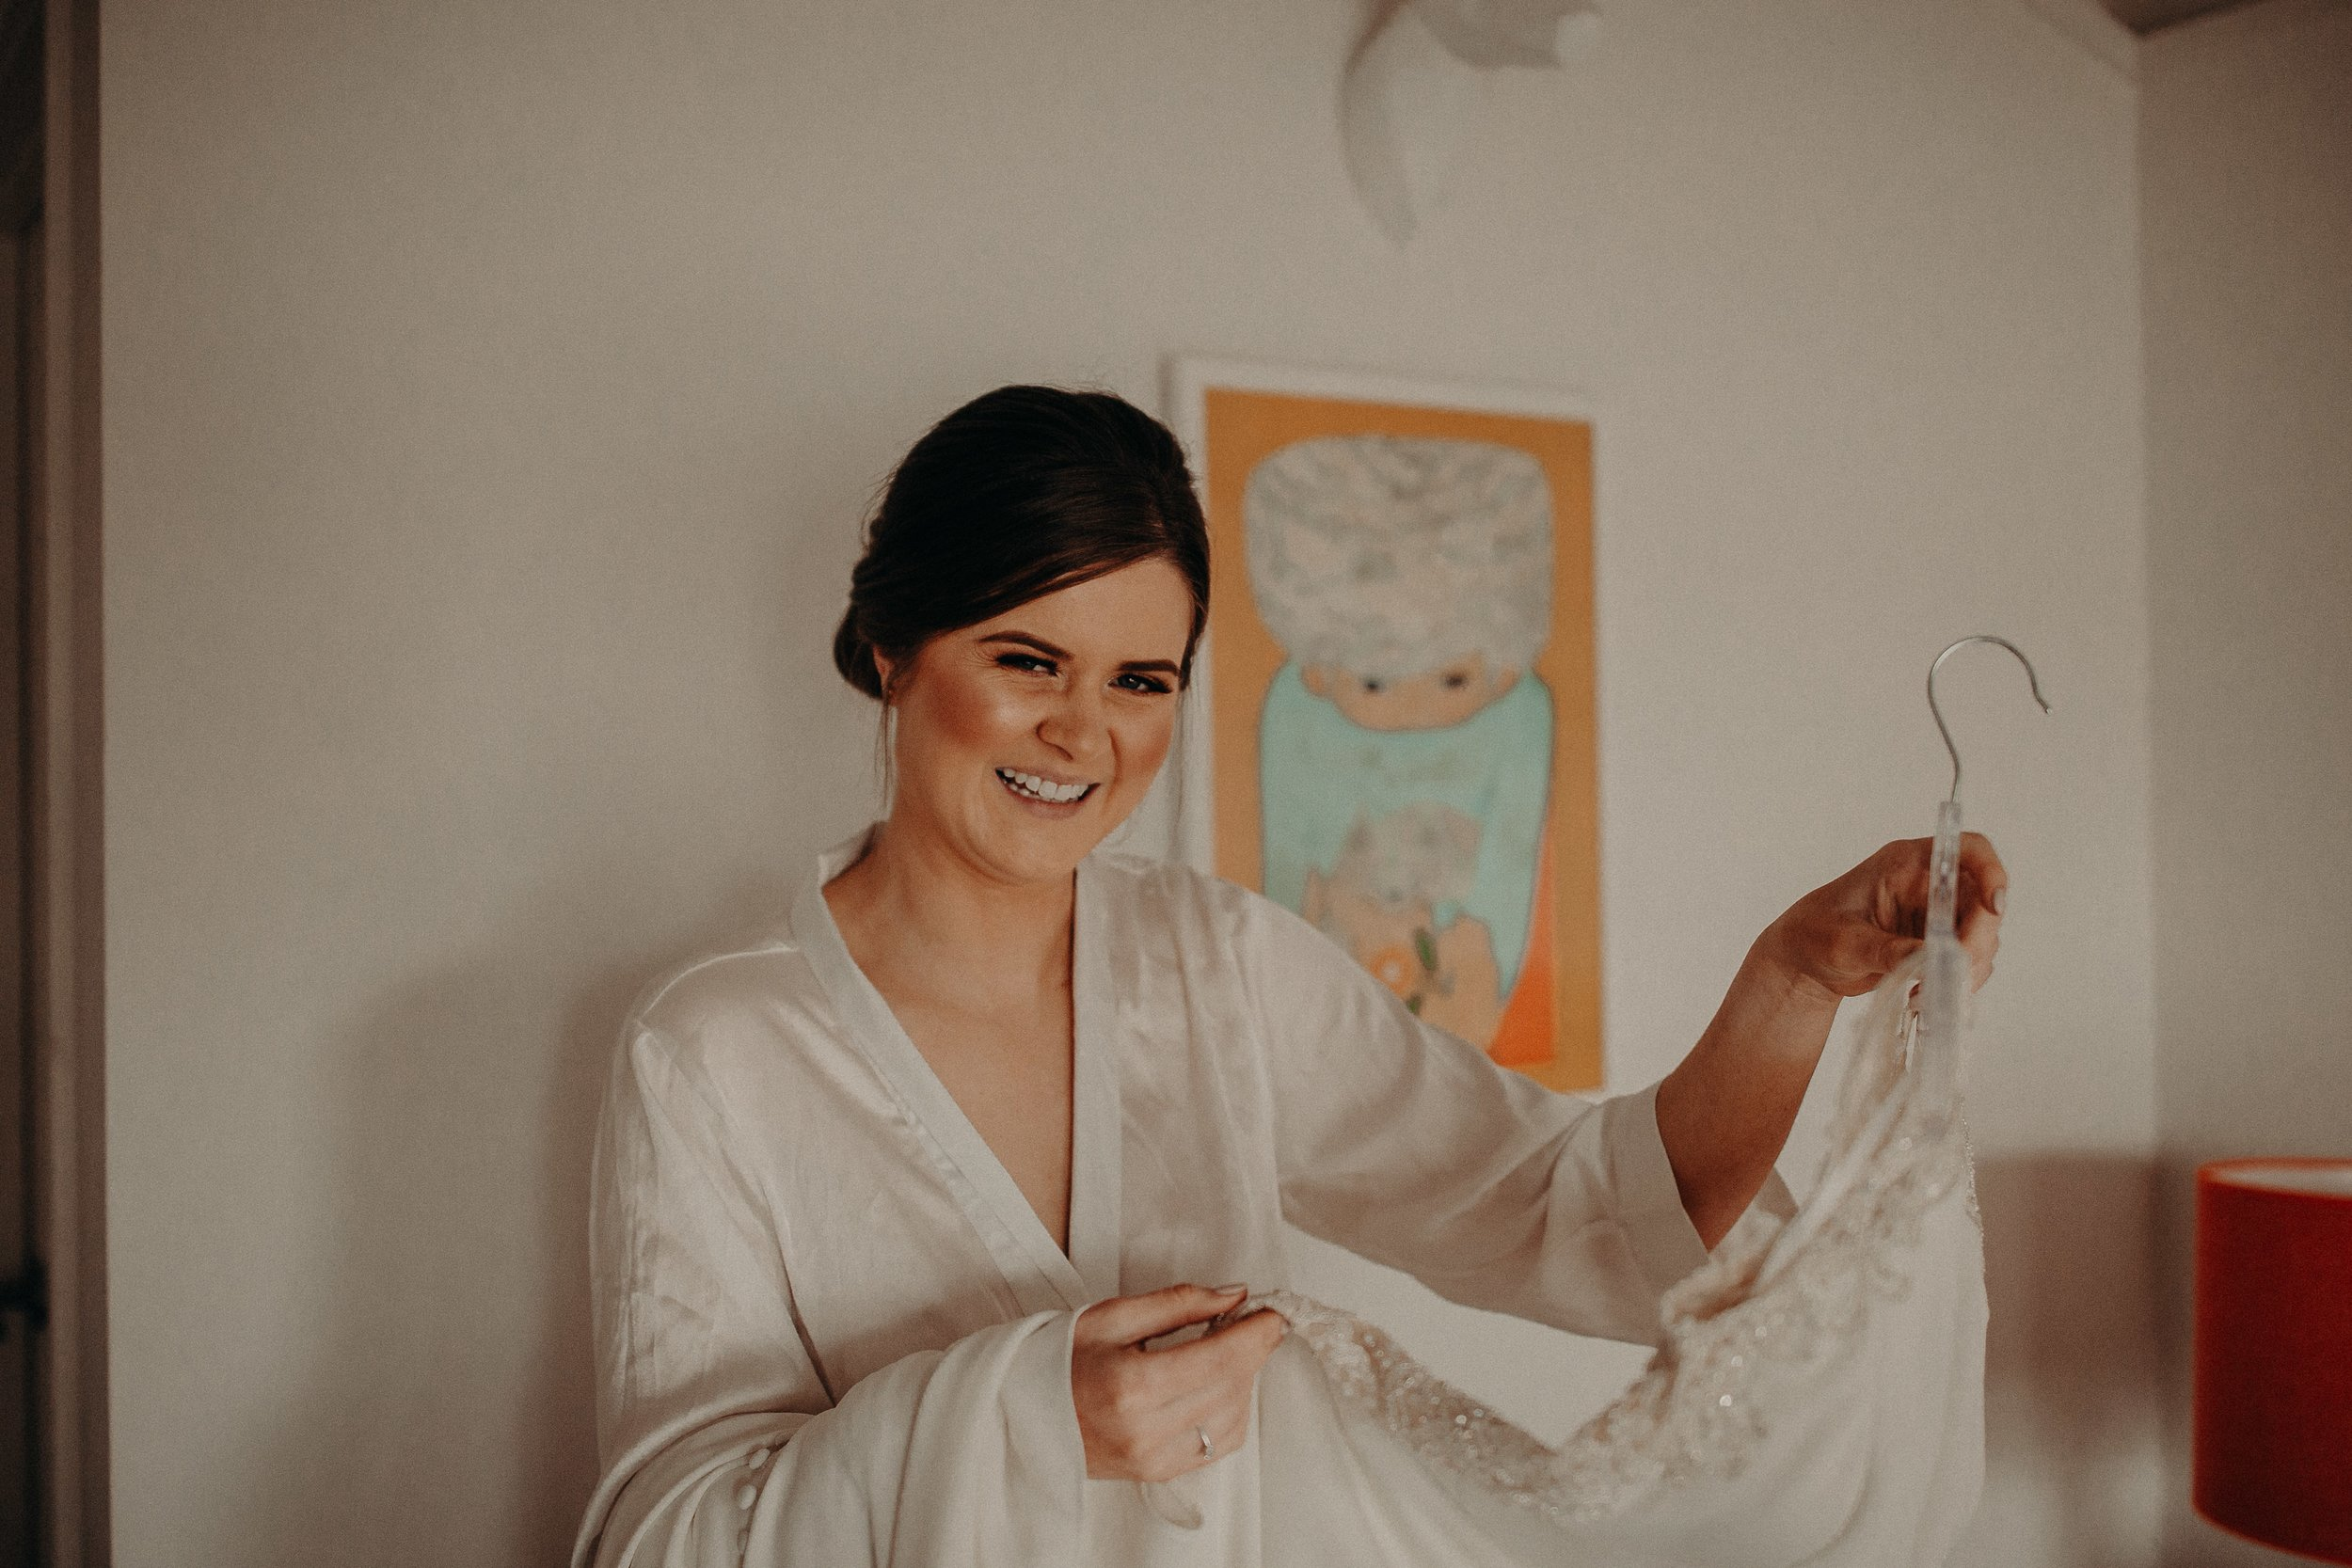 mickalathomas_puremacphotography_weddingphotographer_couplephotographer_Sheppartonphotographer_2484.jpg